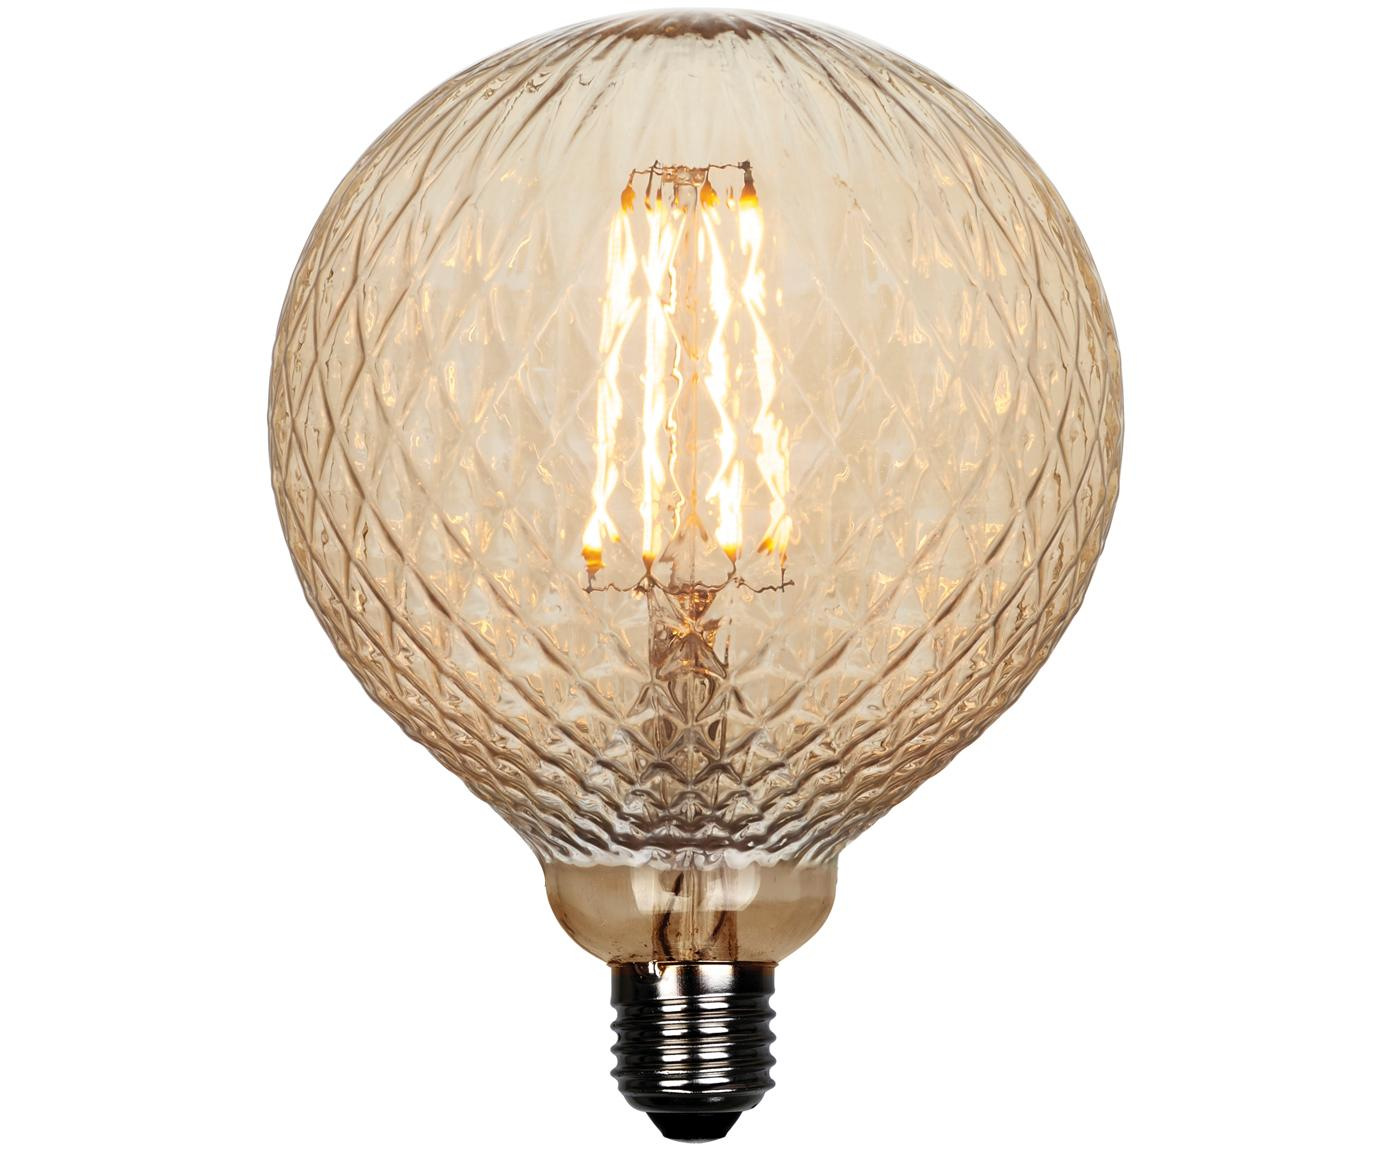 XL LED lamp Facet (E27 / 2W), Peertje: glas, Fitting: aluminium, Beige, aluminium, Ø 13 x H 19 cm